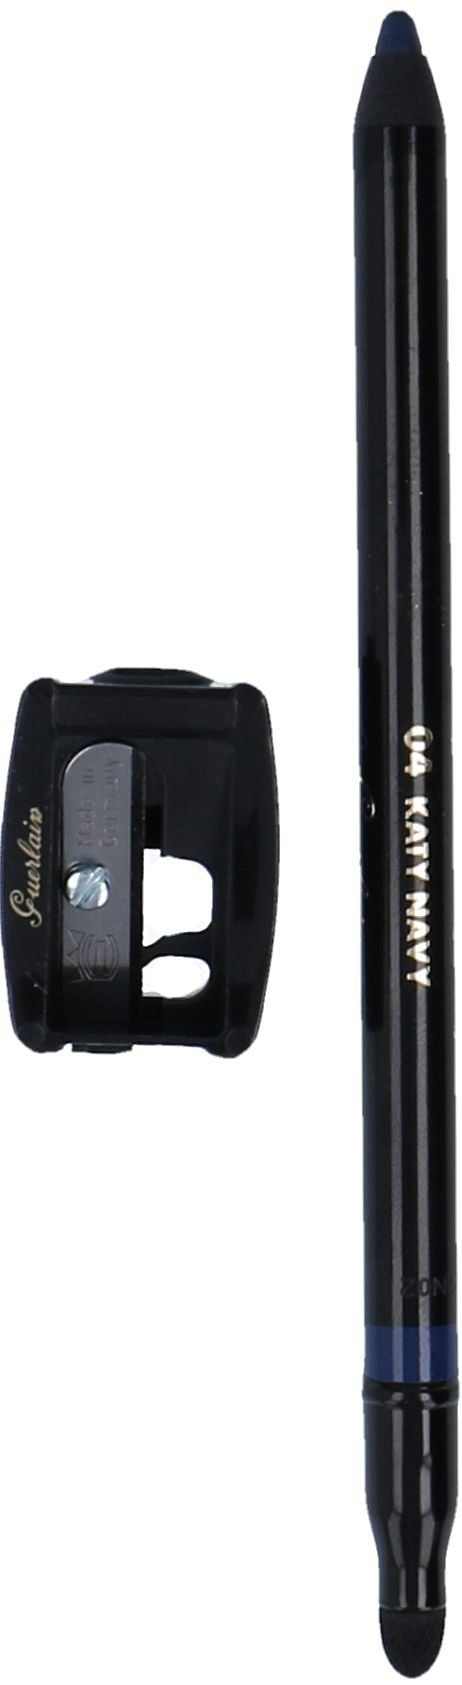 Guerlain The Eye Pencil Cosmetic 1,2ml 04 Katy Navy